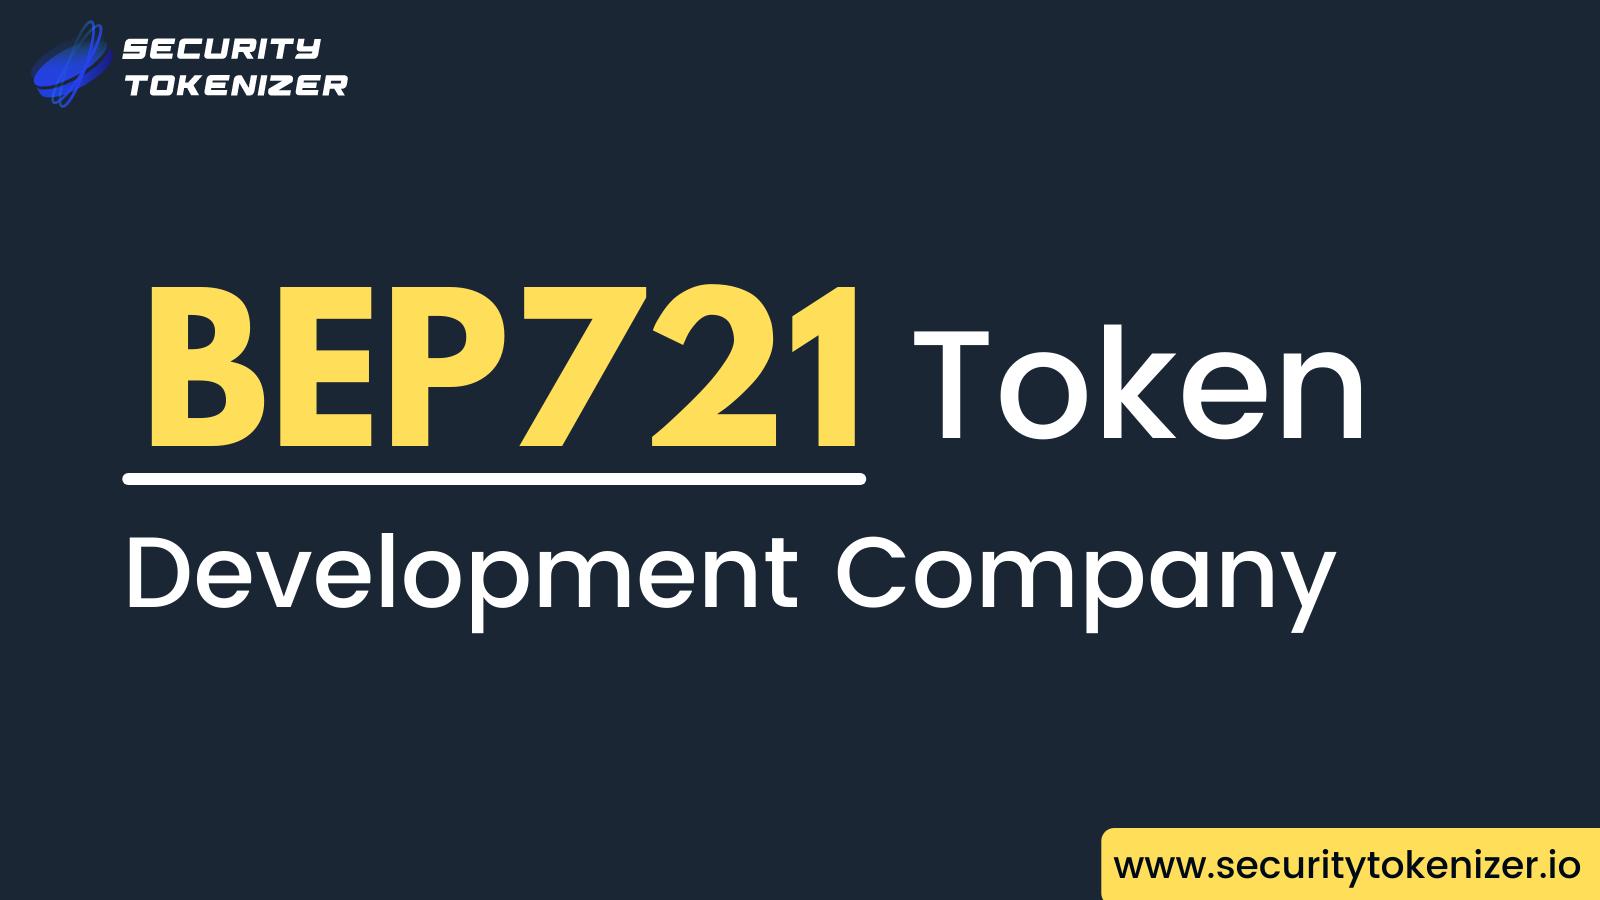 BEP721 Token Development Company